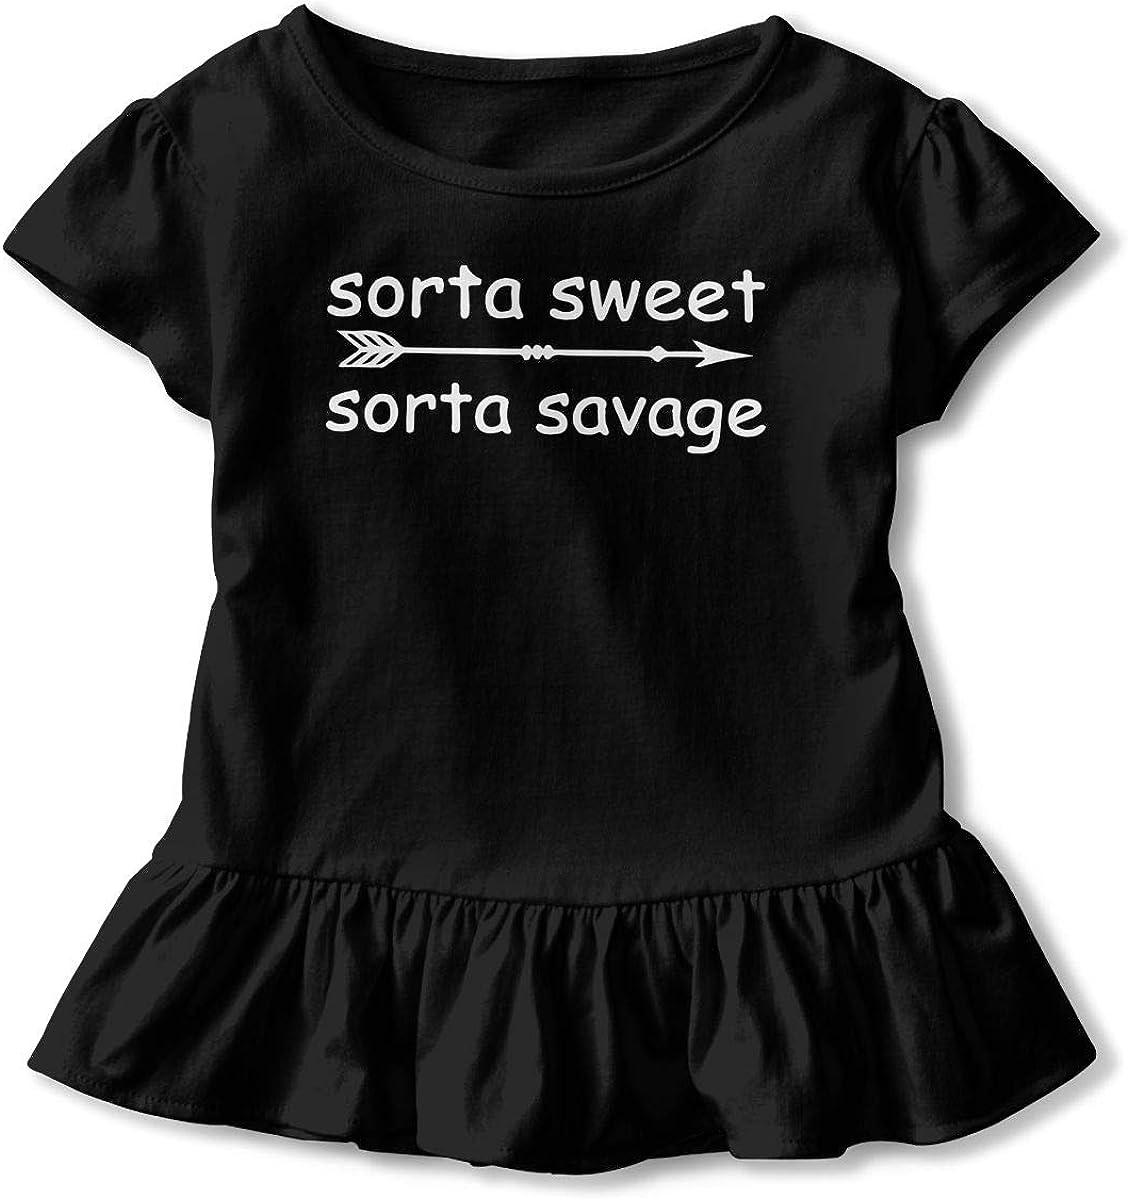 Zi7J9q-0 Short-Sleeve Sorta Sweet Sorta Savage T-Shirts for Kids 2-6T Ruffled Tunic Tops with Falbala